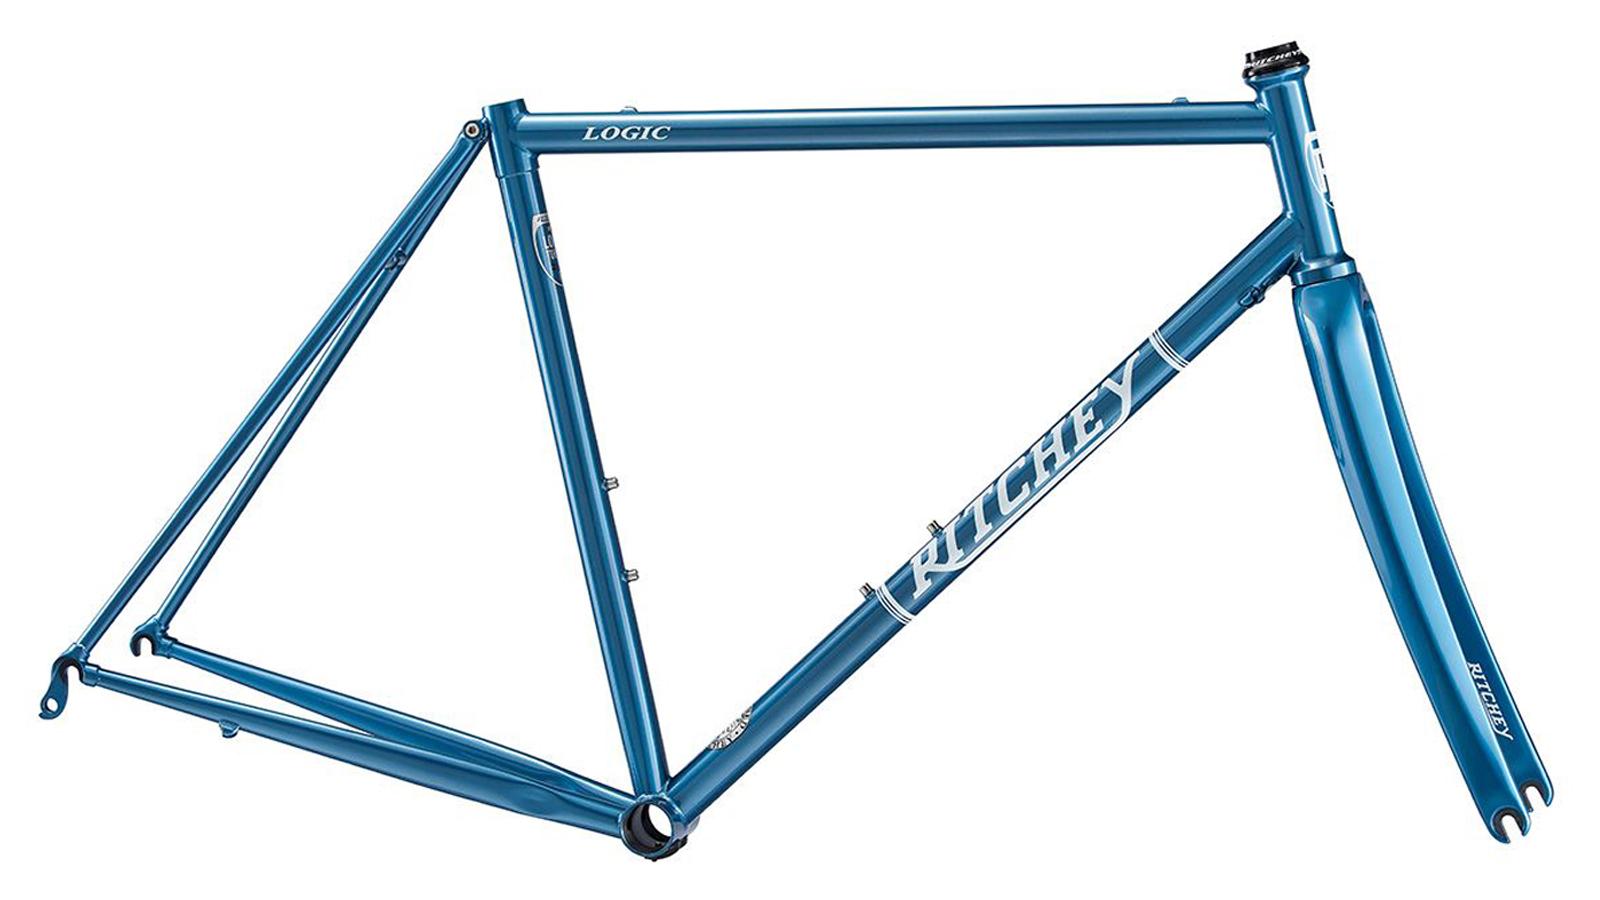 Best steel bikes: Ritchey